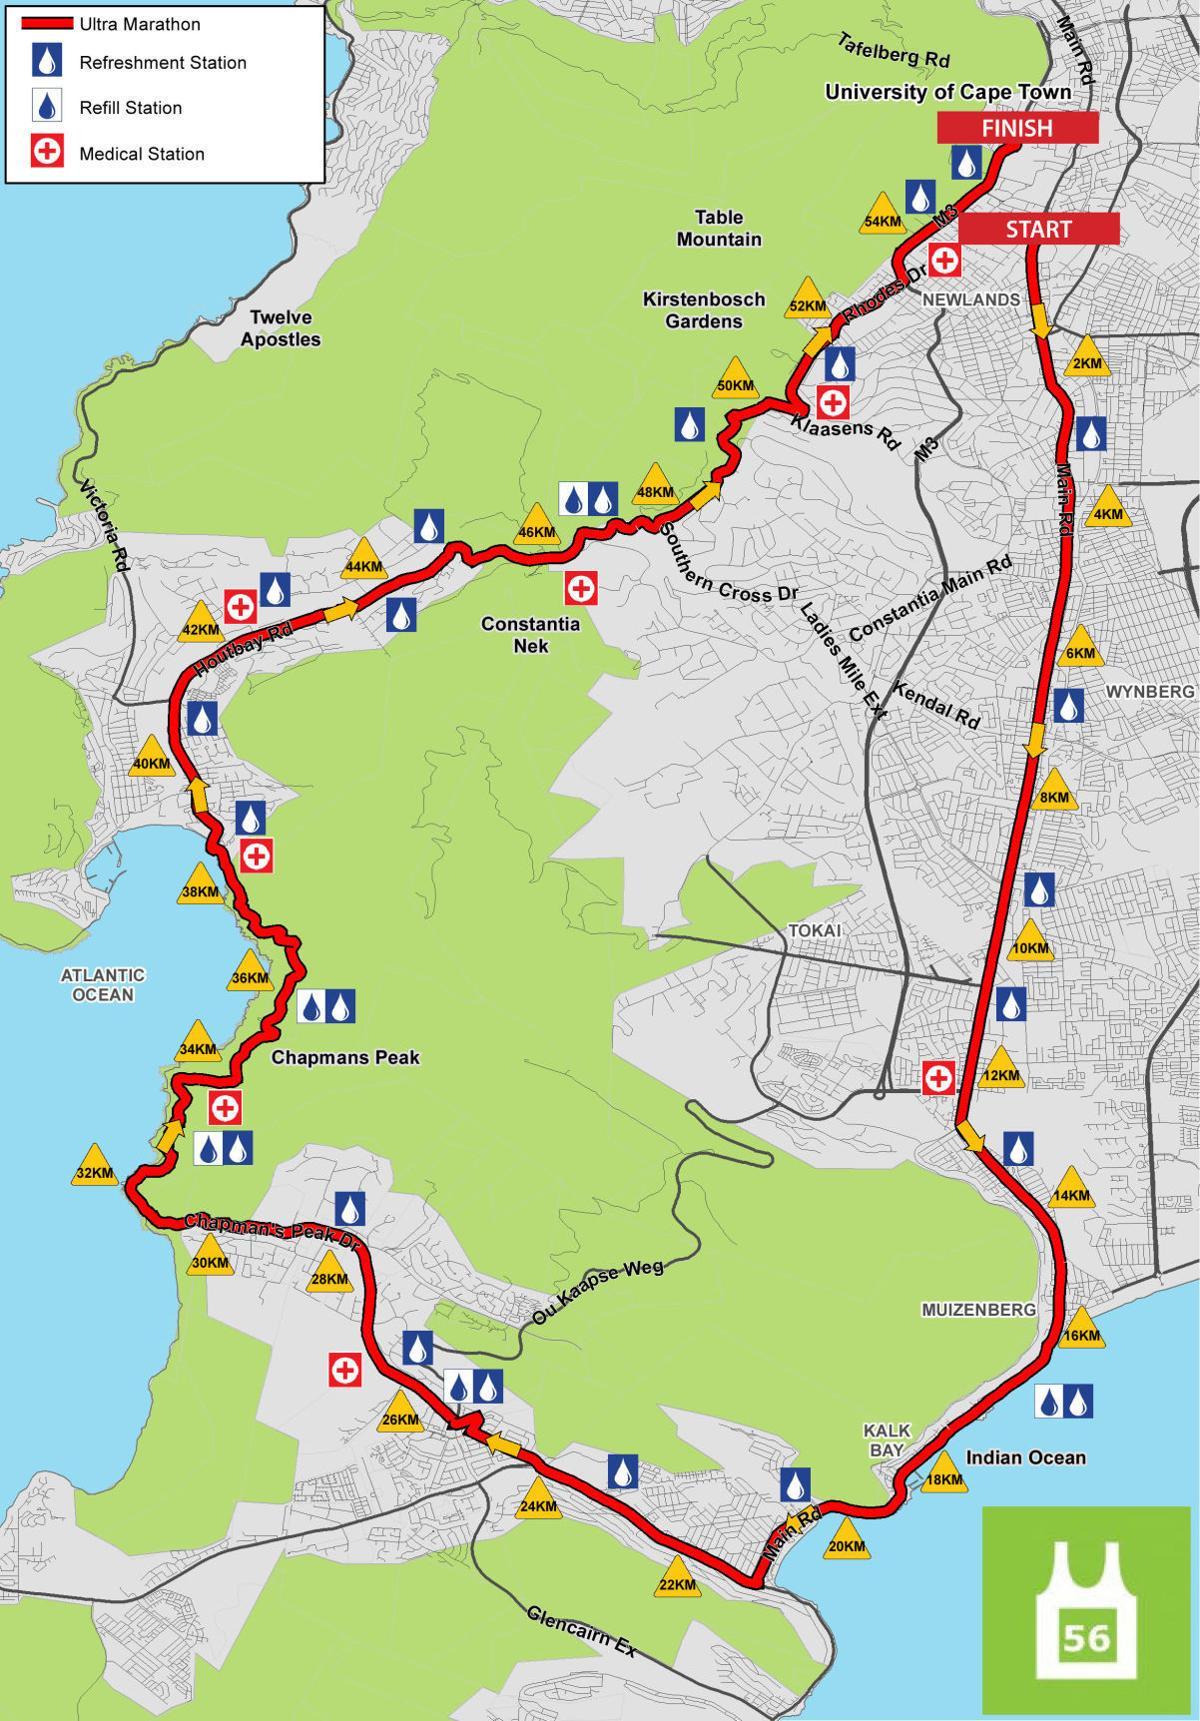 Two Oceans Ultra Marathon Course